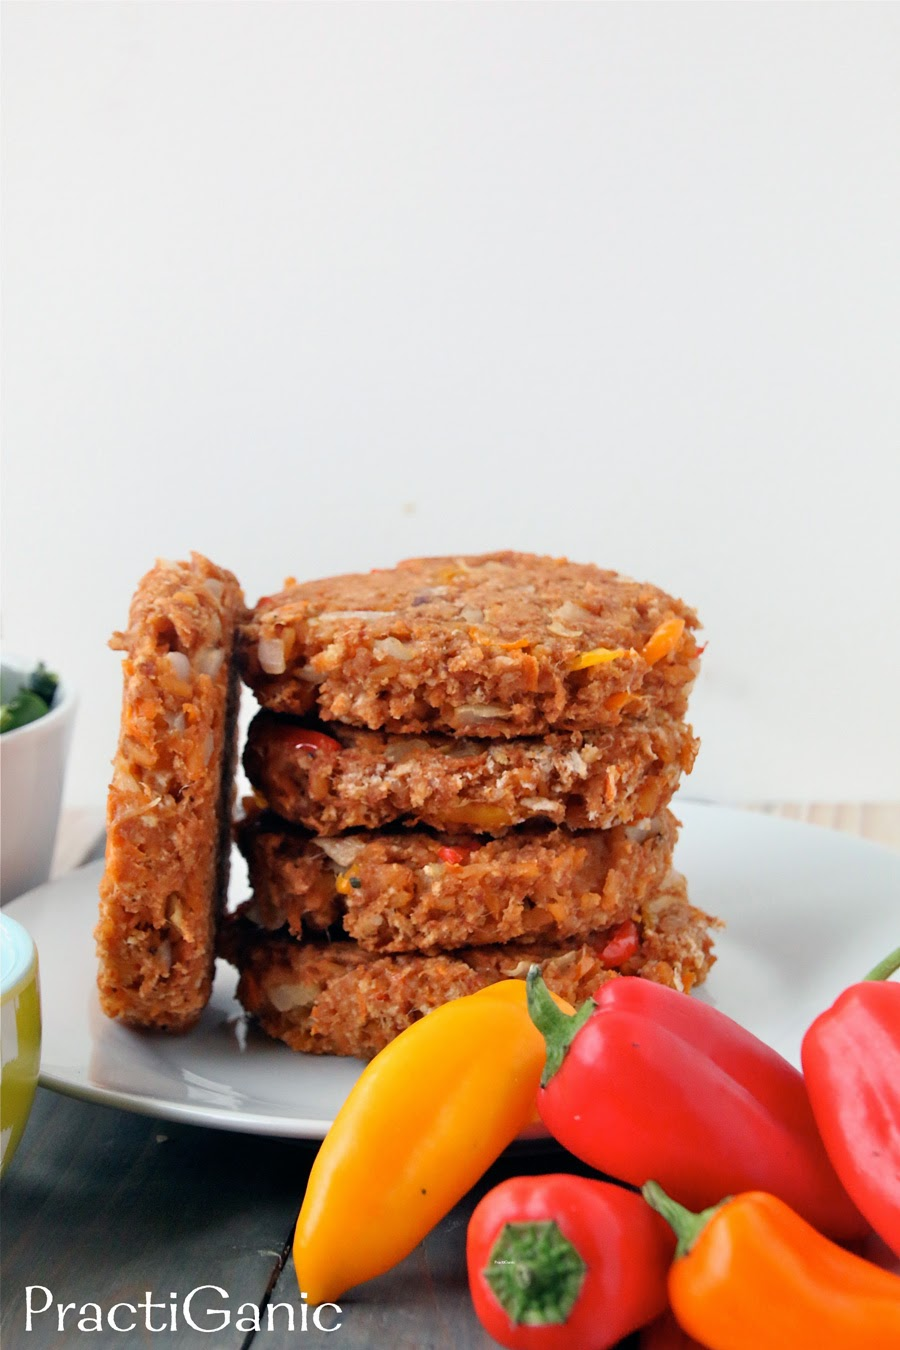 Leftover Refried Beans & Rice Burgers | PractiGanic: Vegetarian ...